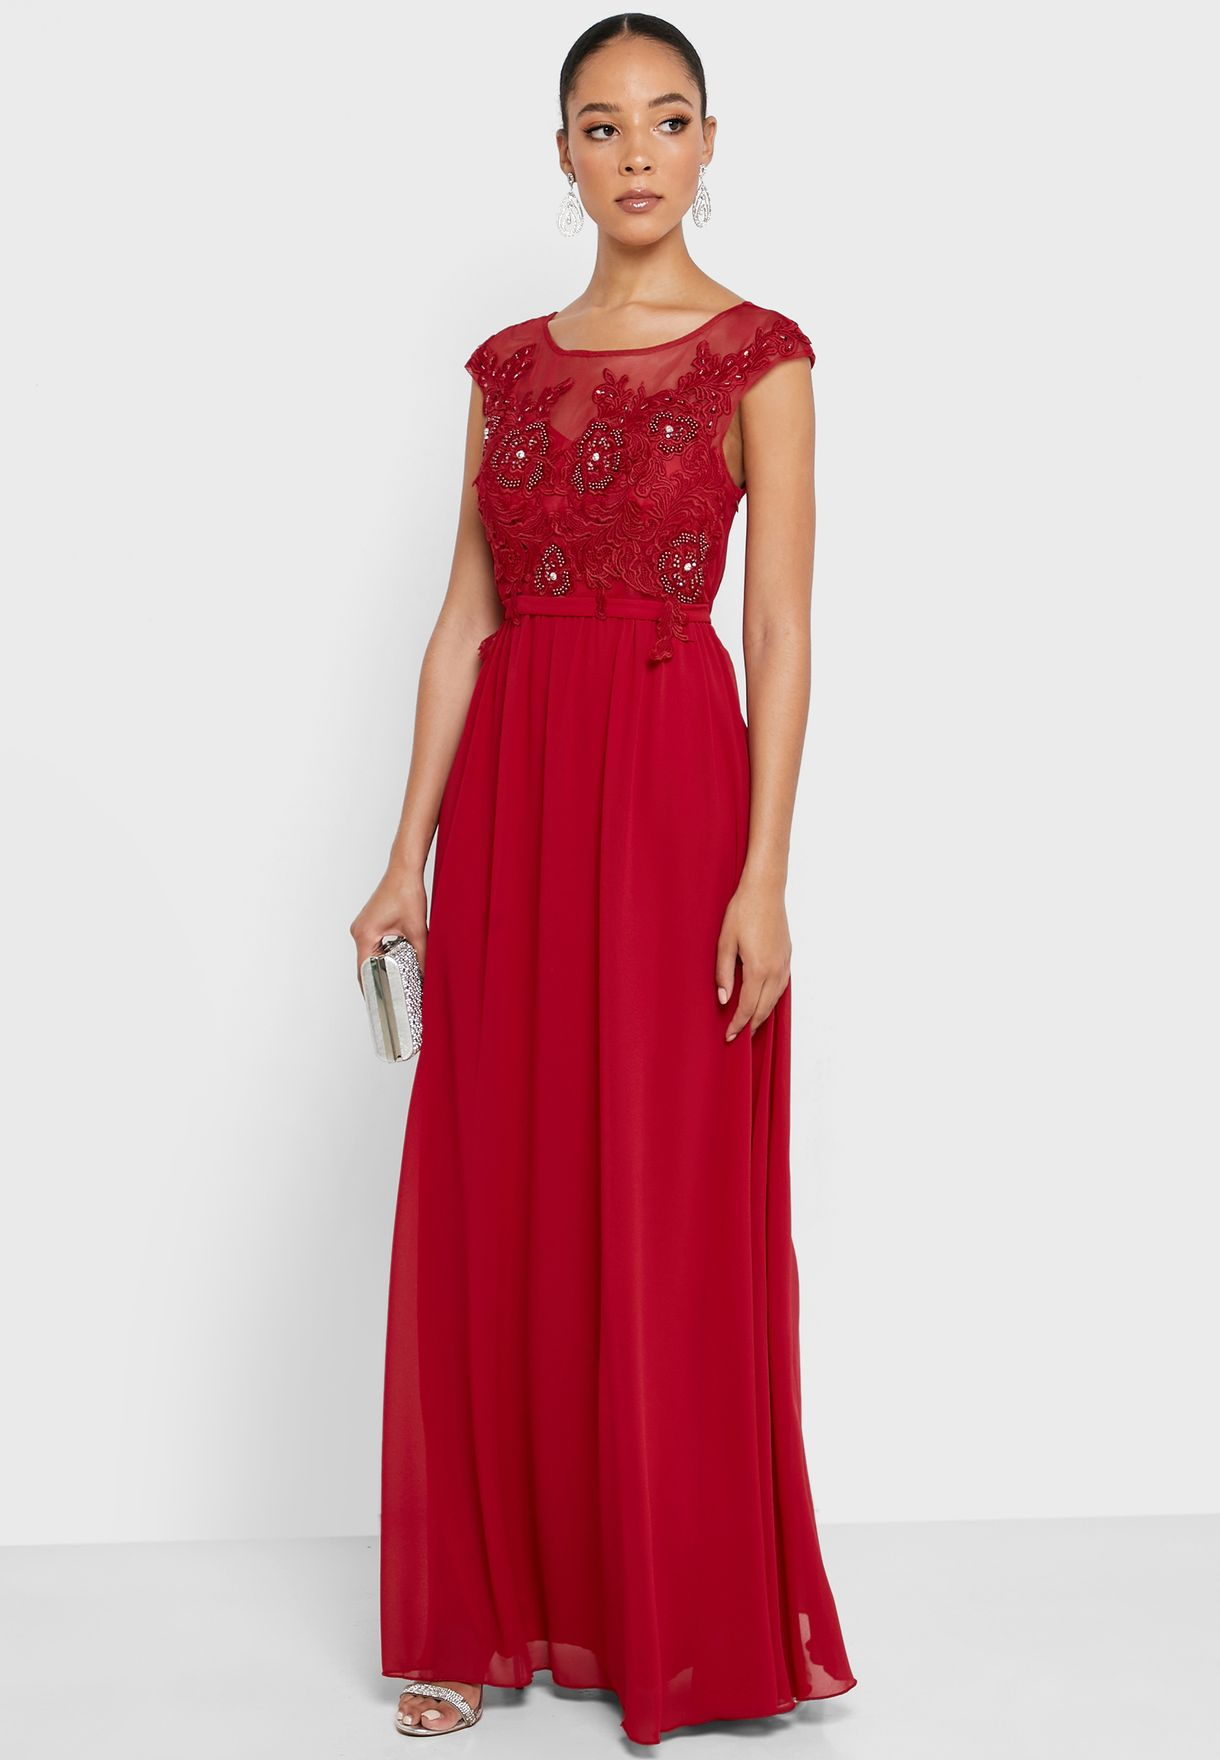 Embellished Detail Top Maxi Dress